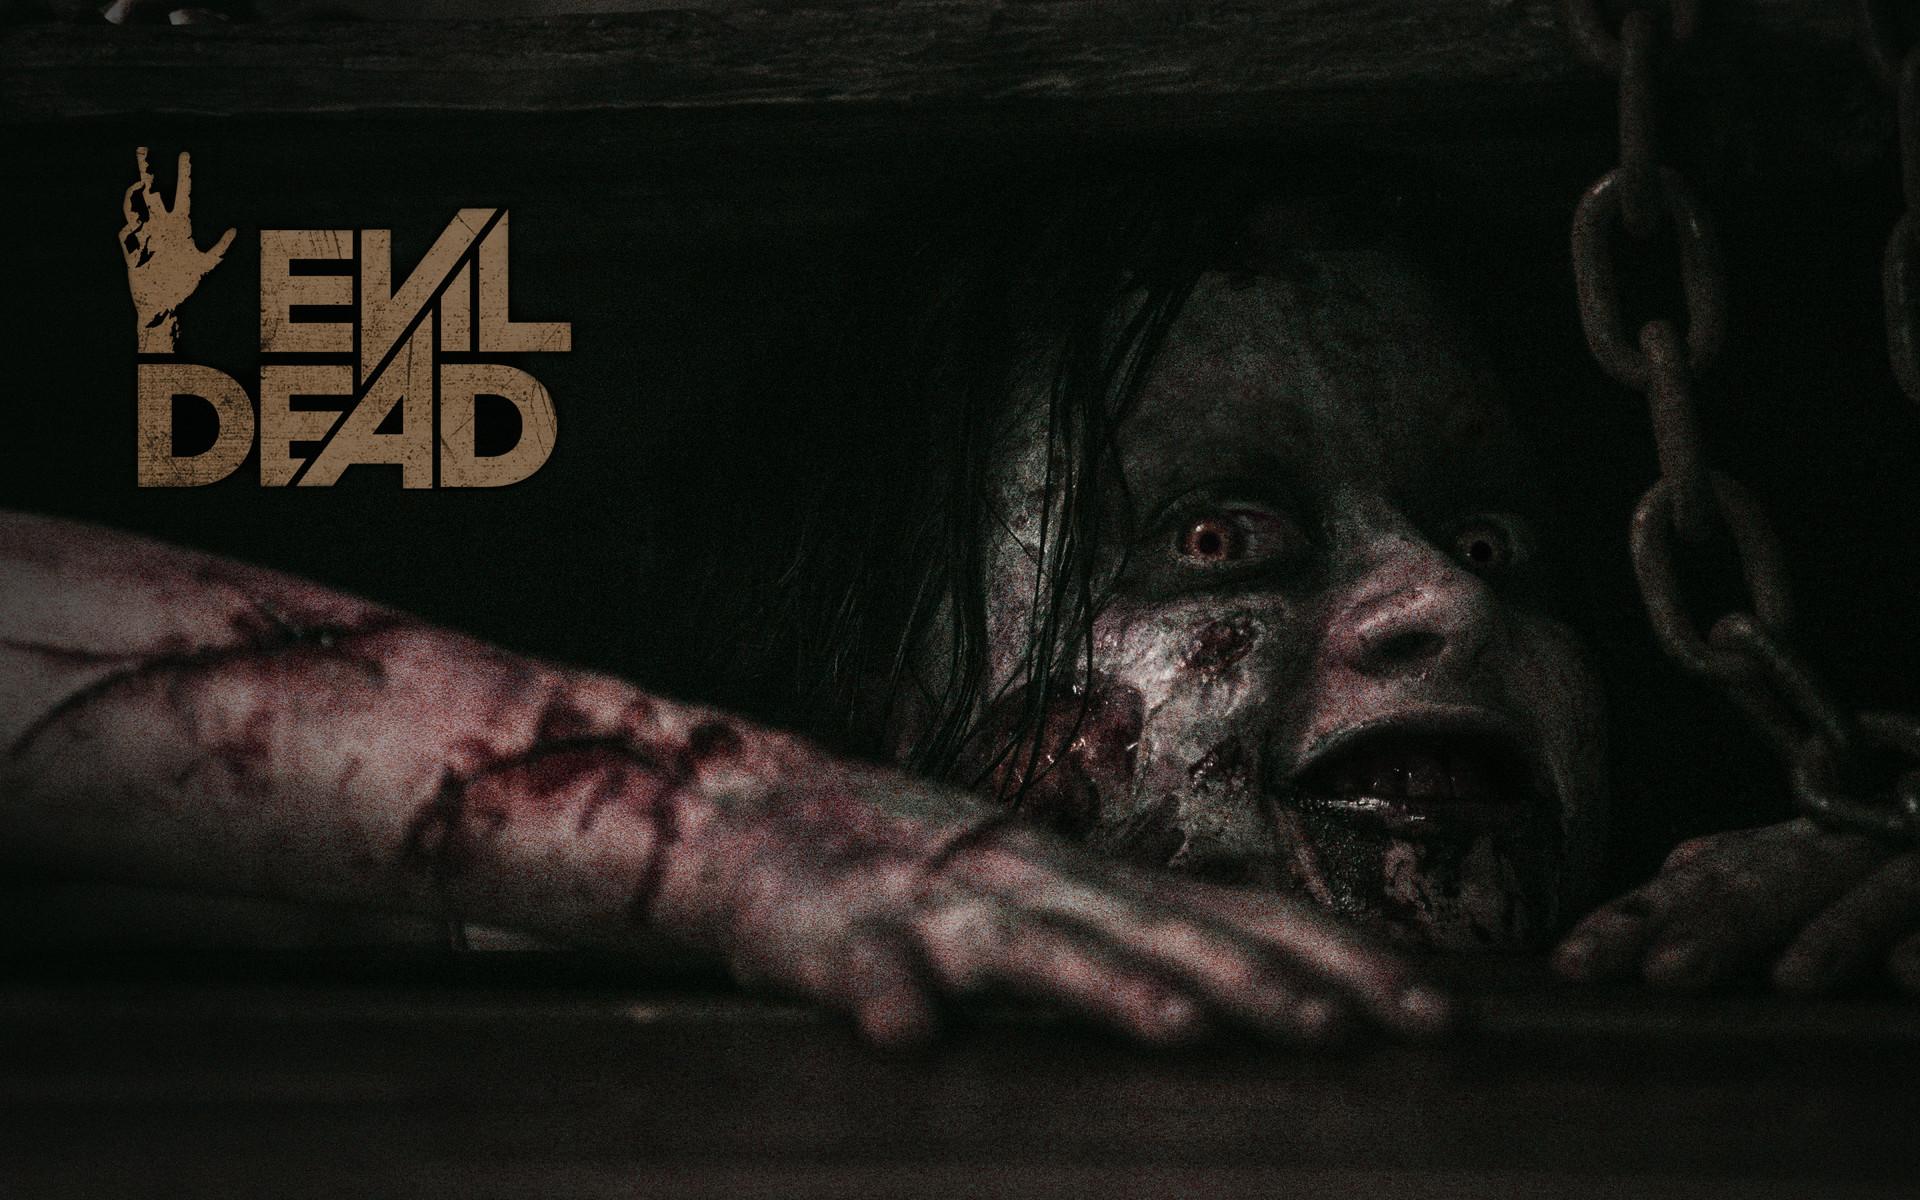 evil-dead-2013-wallpaper-hd